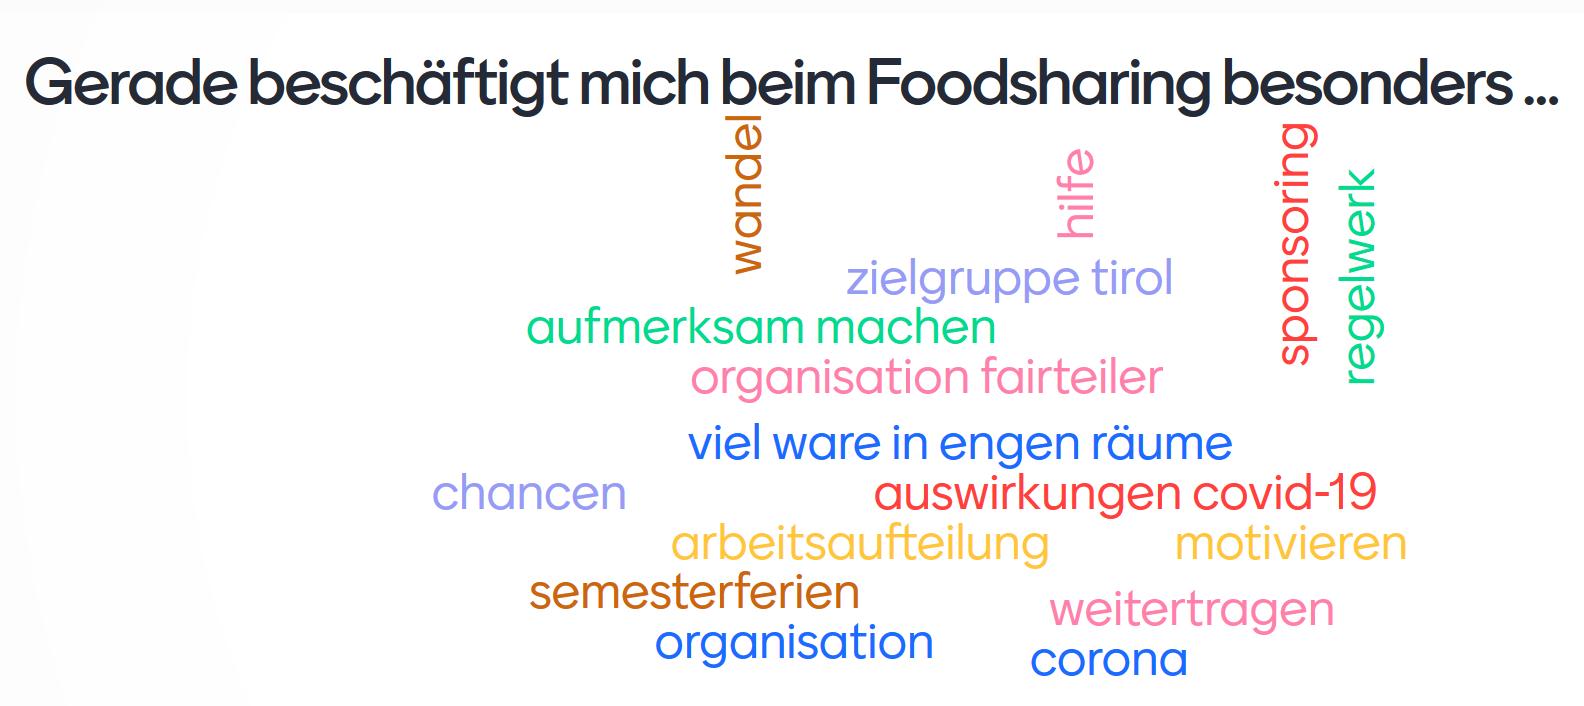 Wordcloud mit menti.com erstellt zum Thema Foodsharing